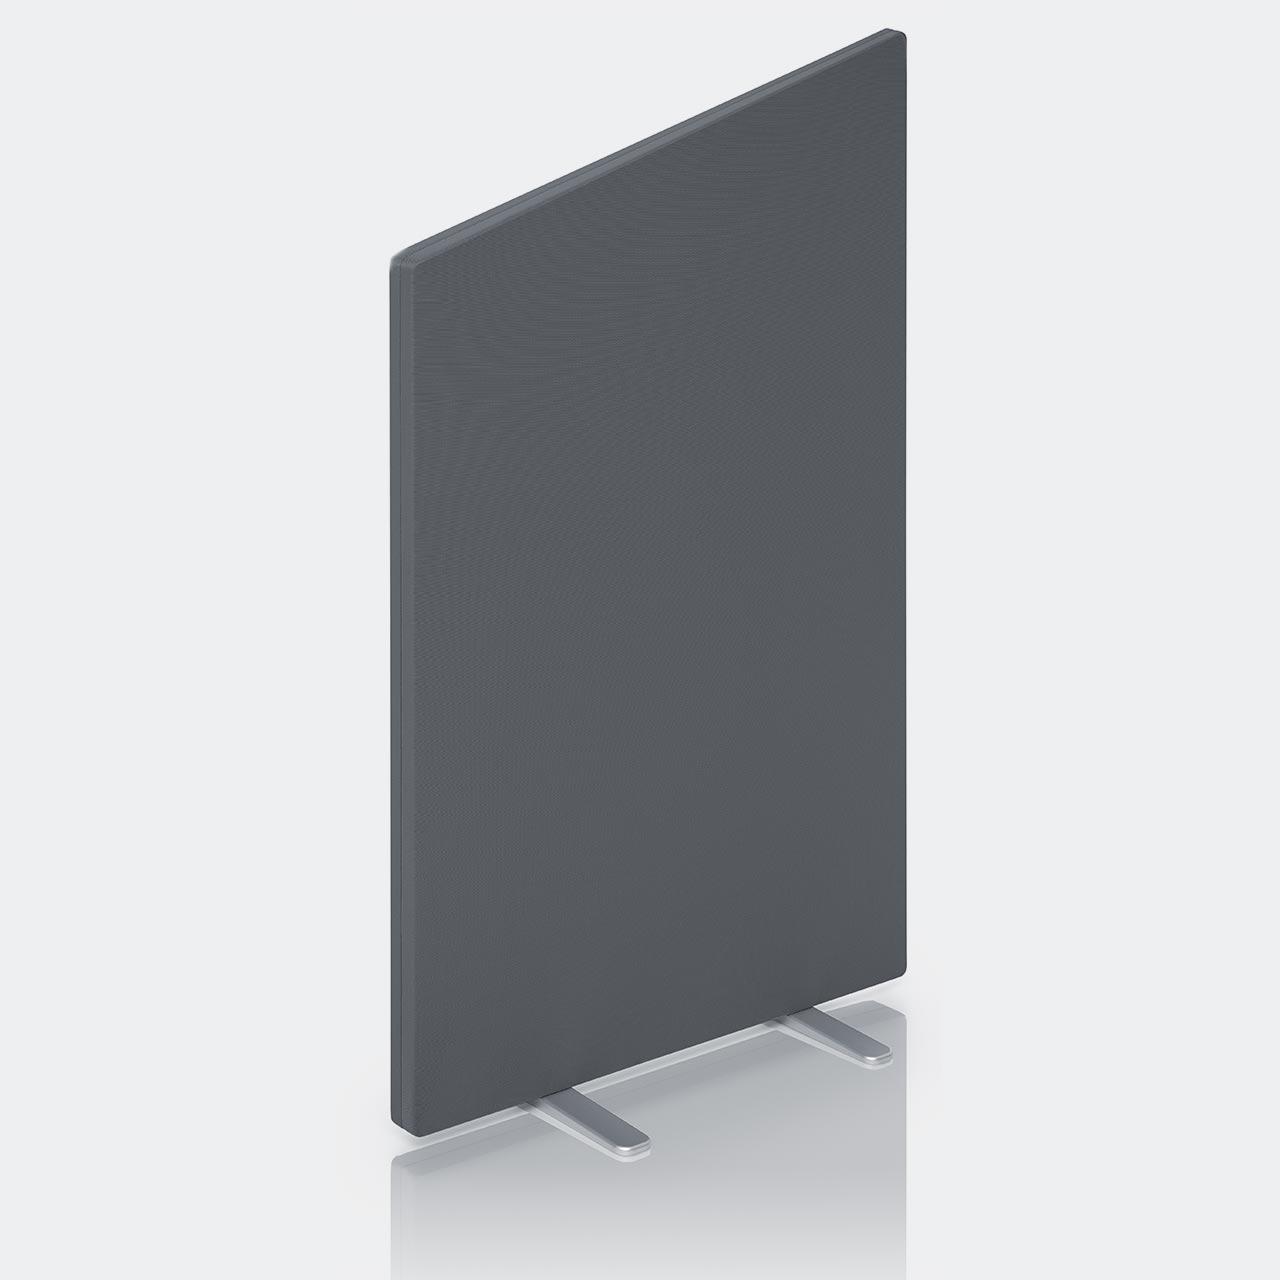 stellw nde wall of silence klassischer schallabsorber b11. Black Bedroom Furniture Sets. Home Design Ideas